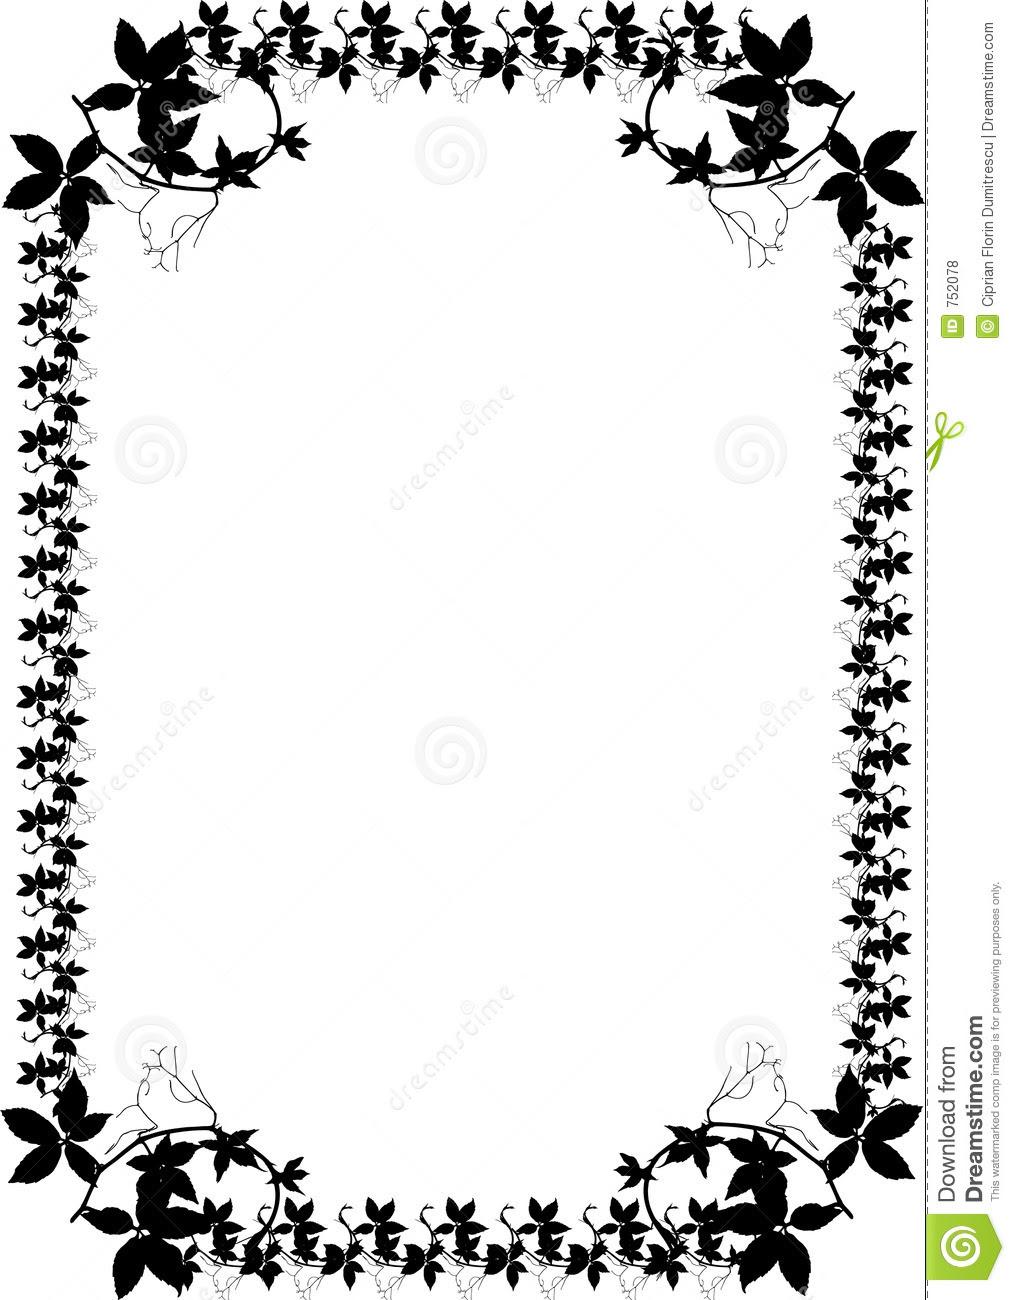 19 Black Border Designs Cool Images Black And White Border Designs Free Cool Black And White Borders And Cool Black And White Border Designs Newdesignfile Com